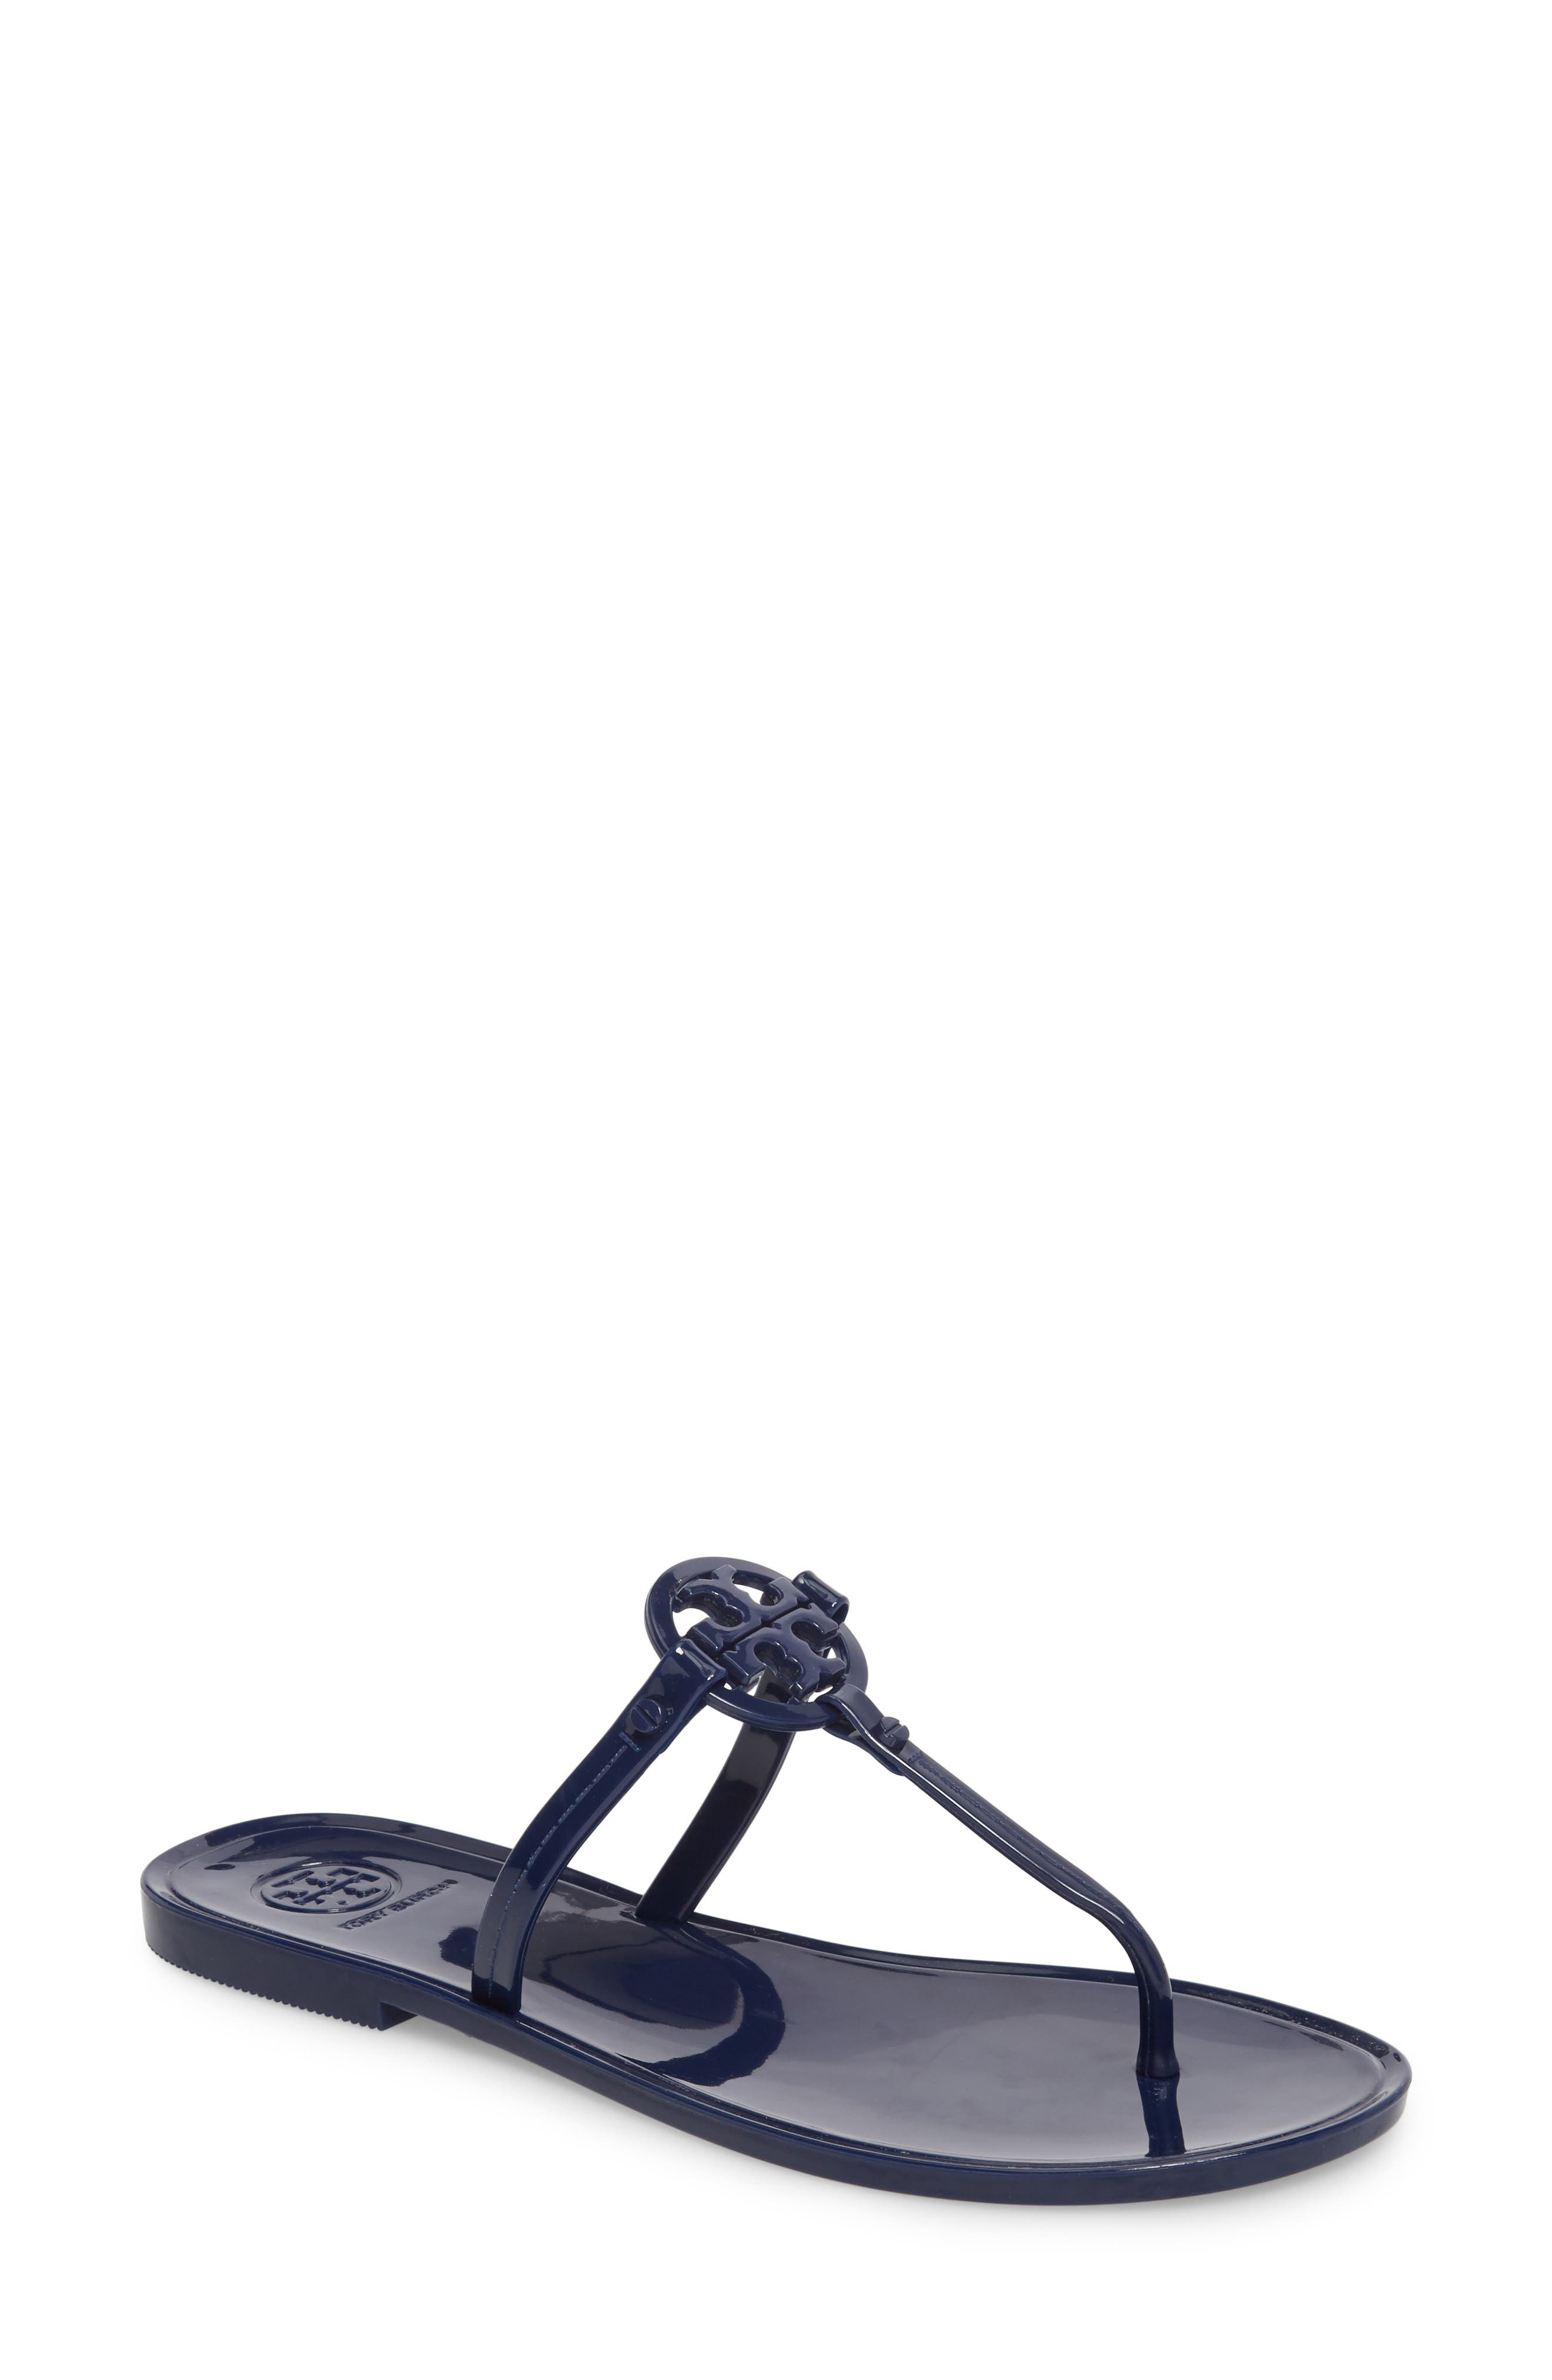 'Mini Miller' Flat Sandal,                         Main,                         color, Bright Indigo